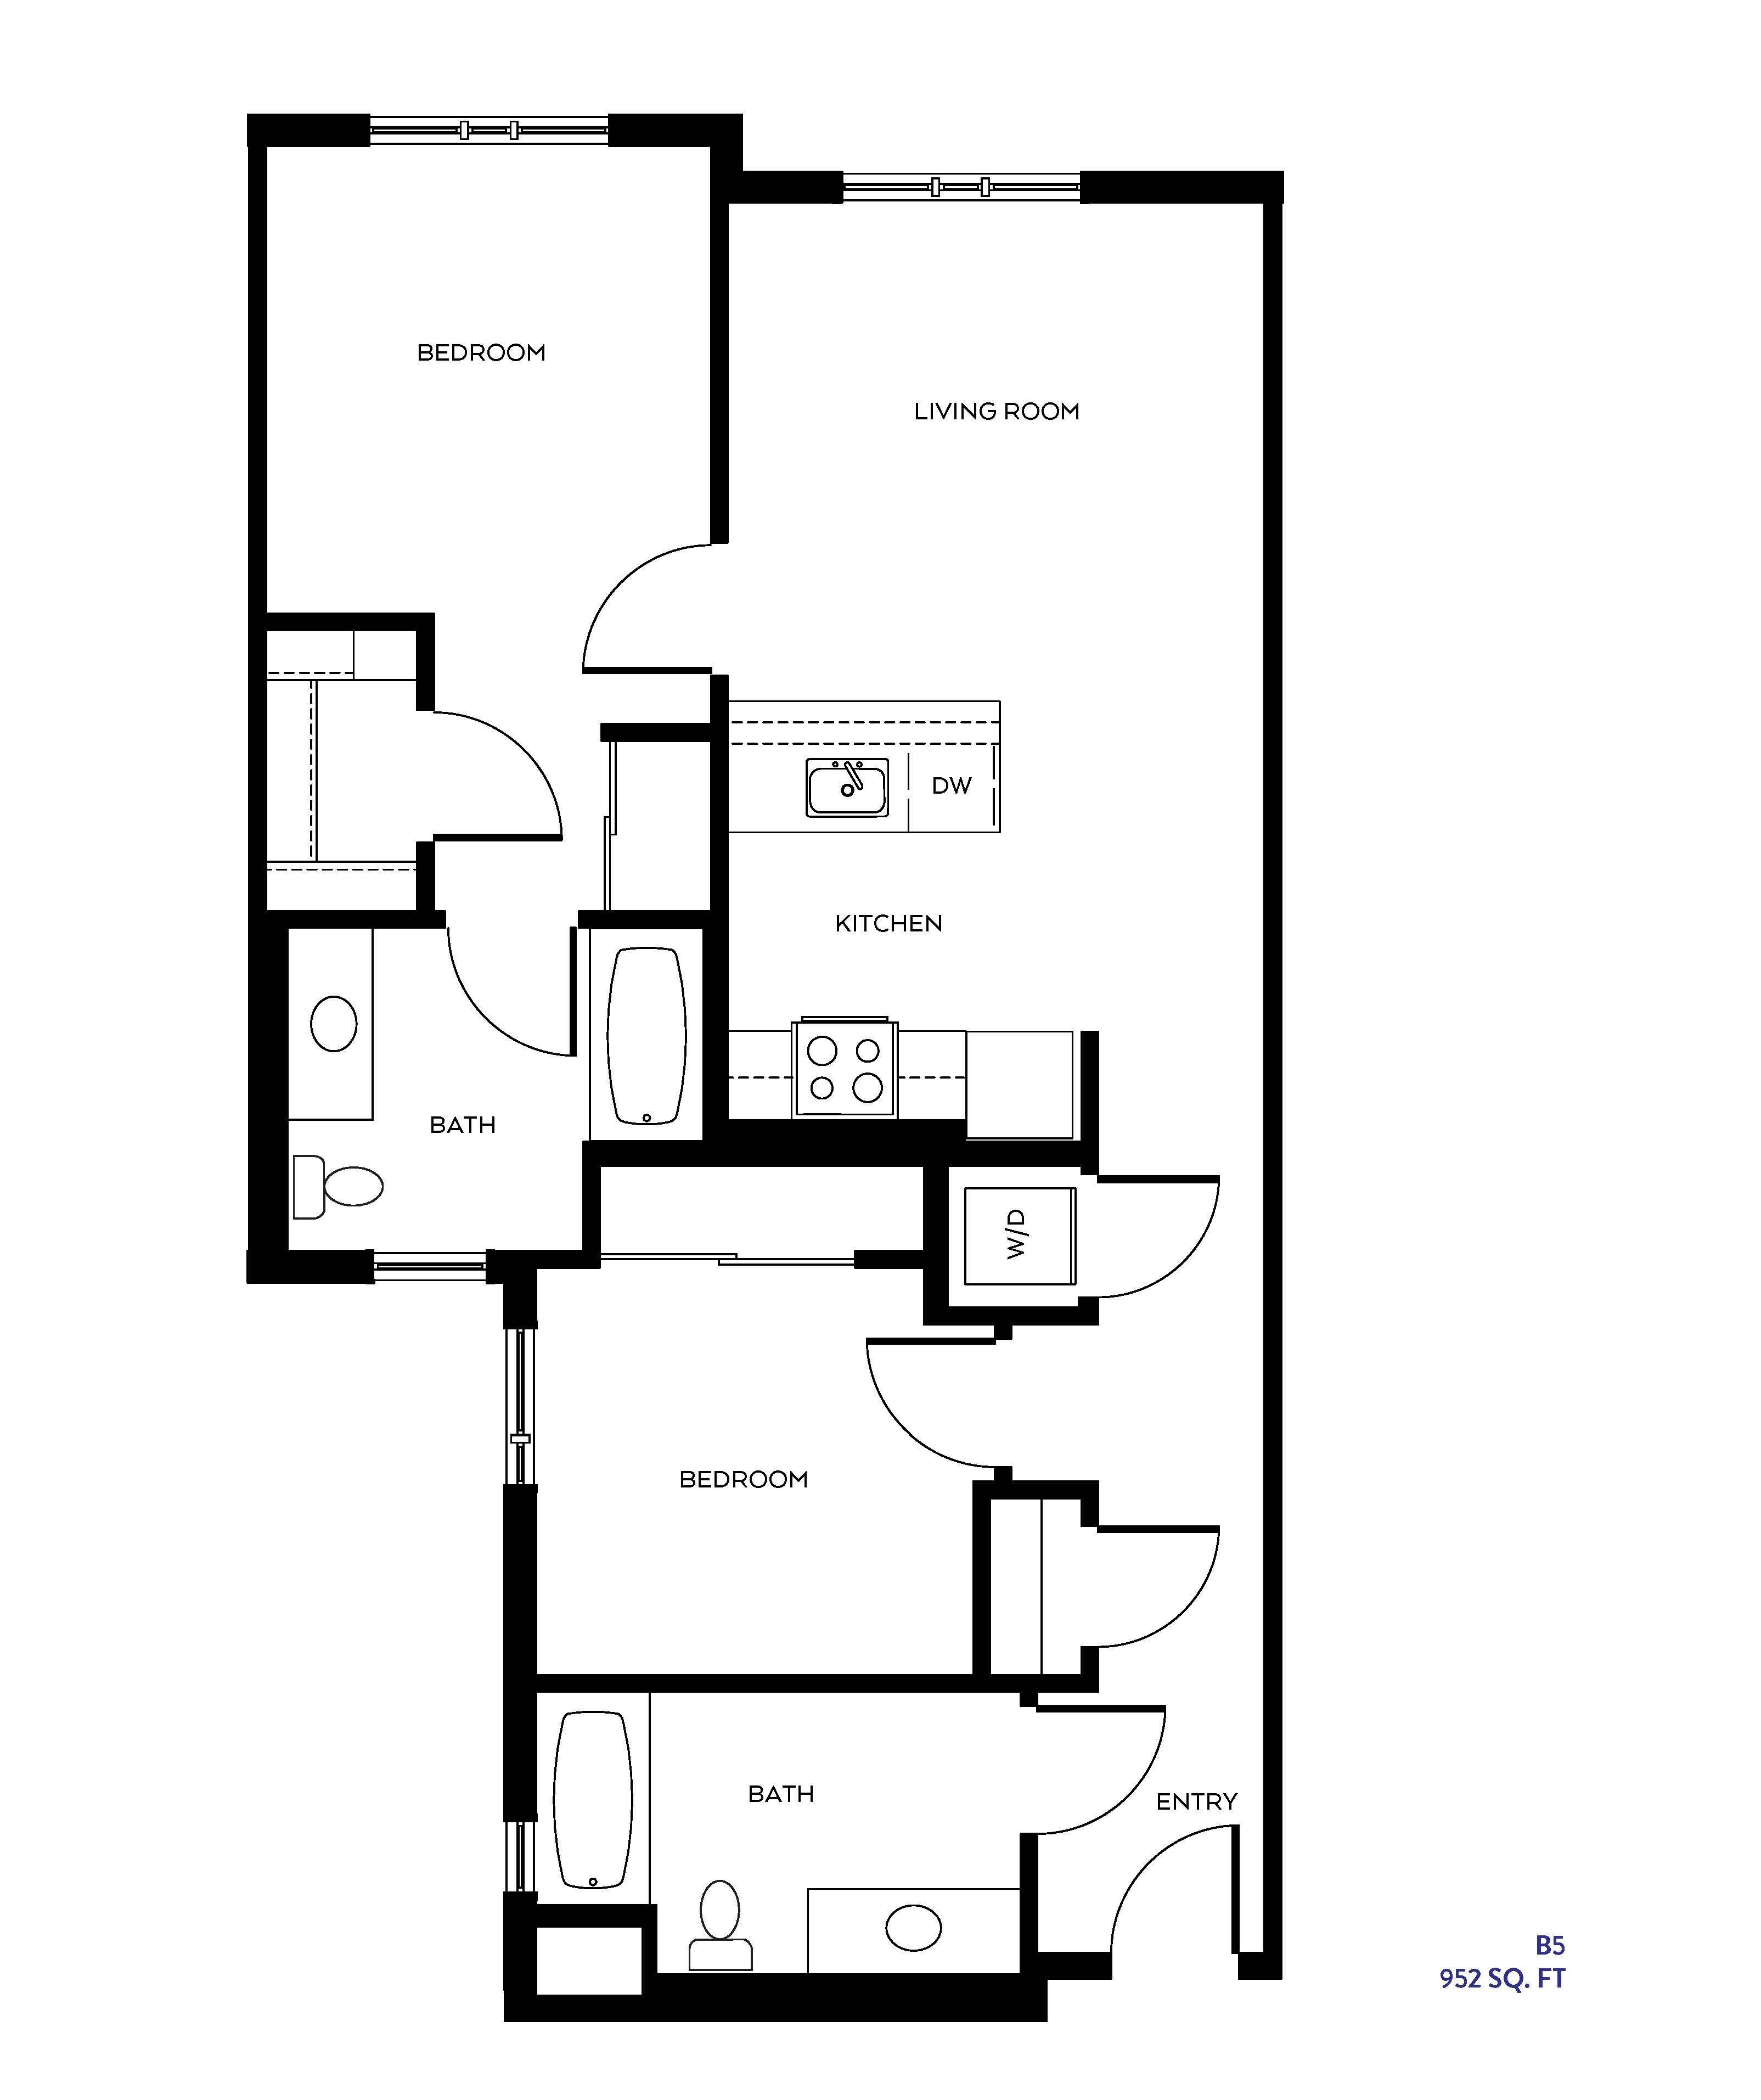 The B5 floor plan